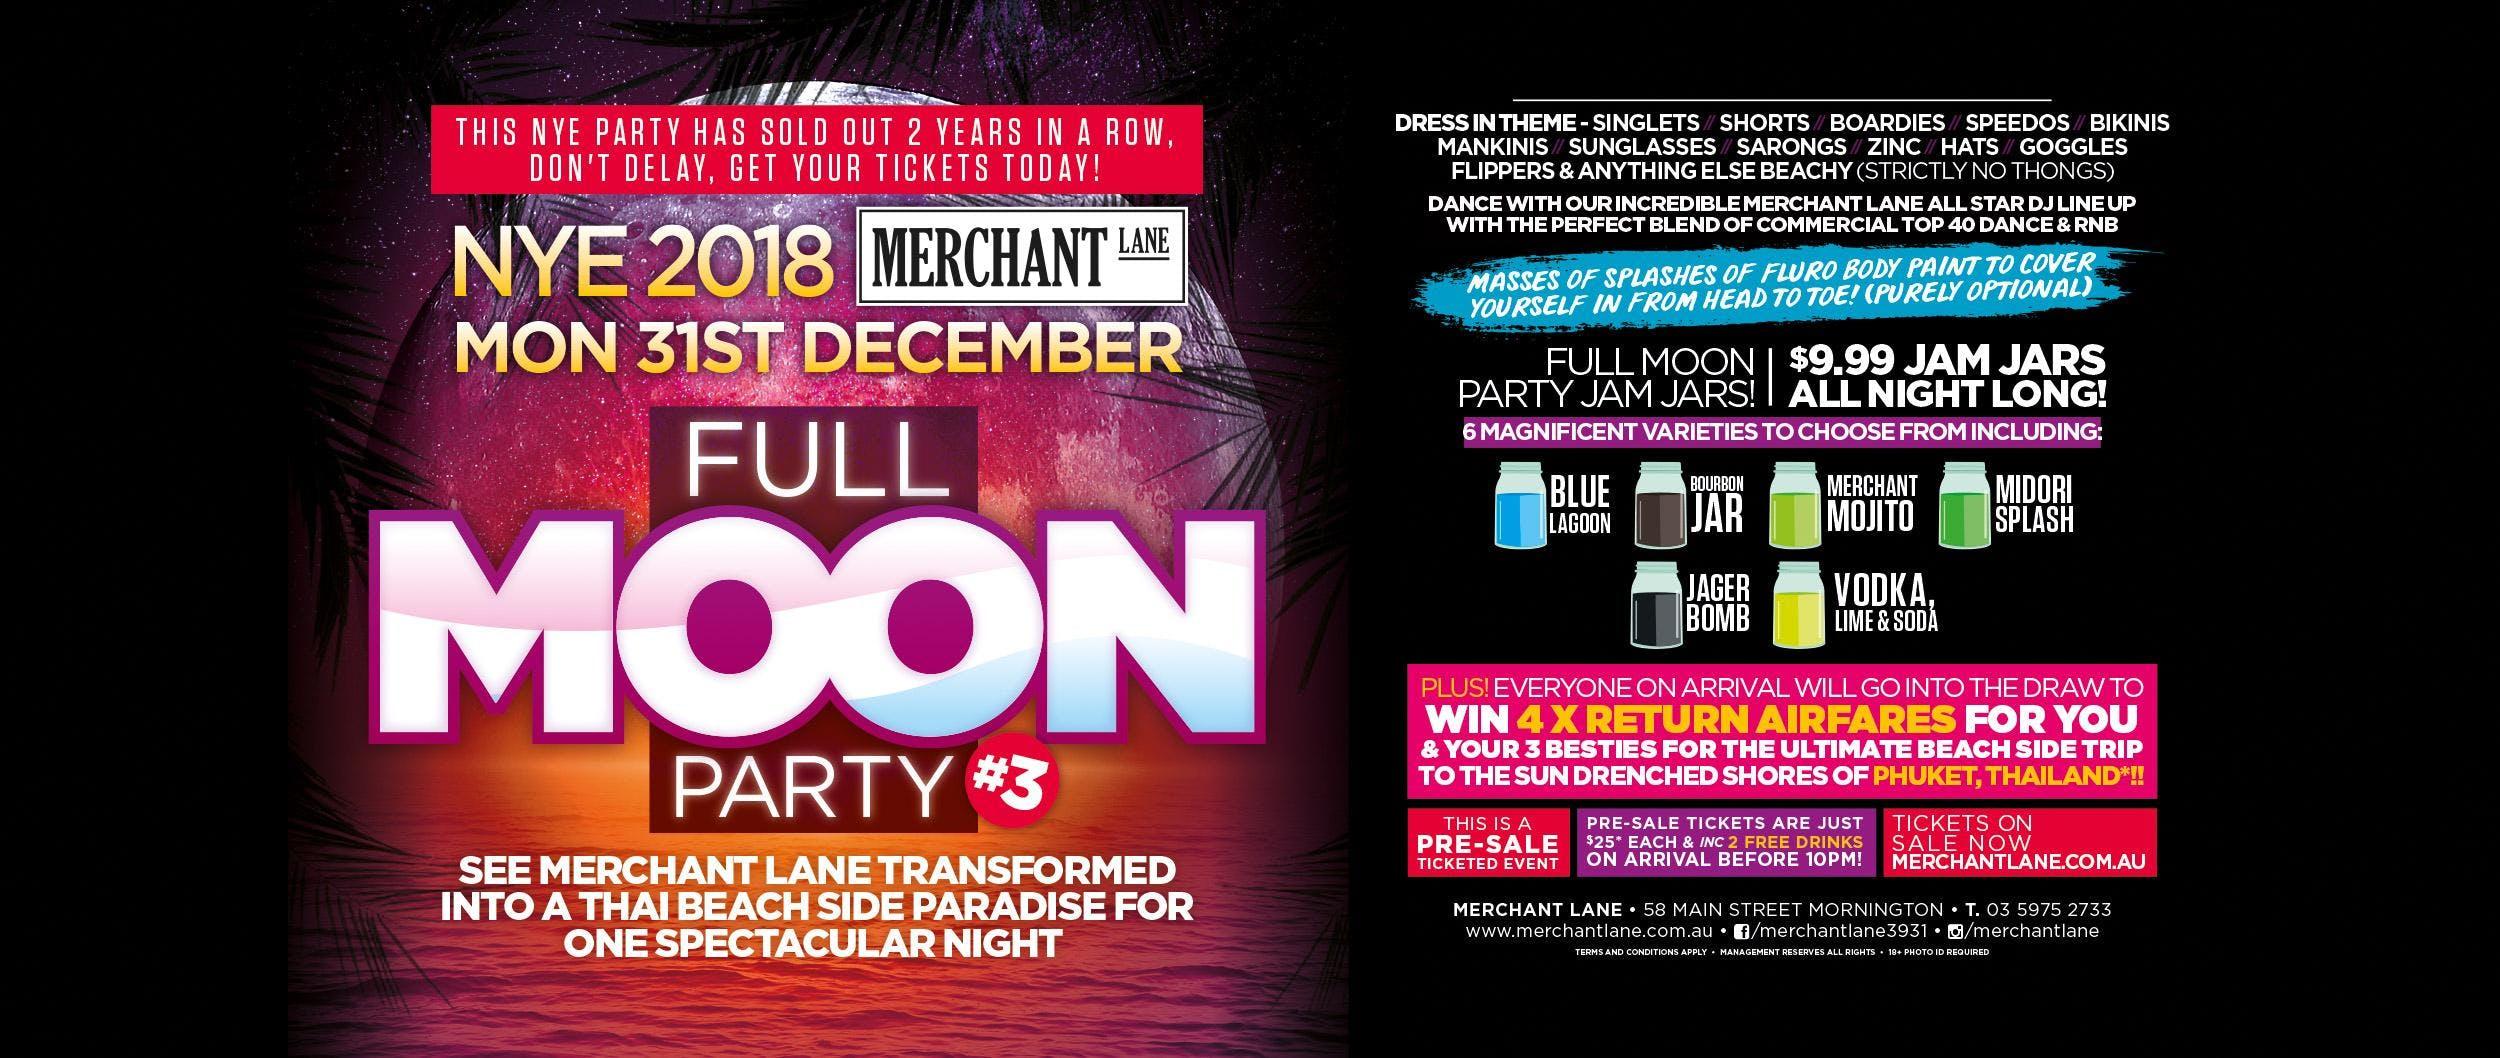 NYE 2018 Full Moon Party #3!